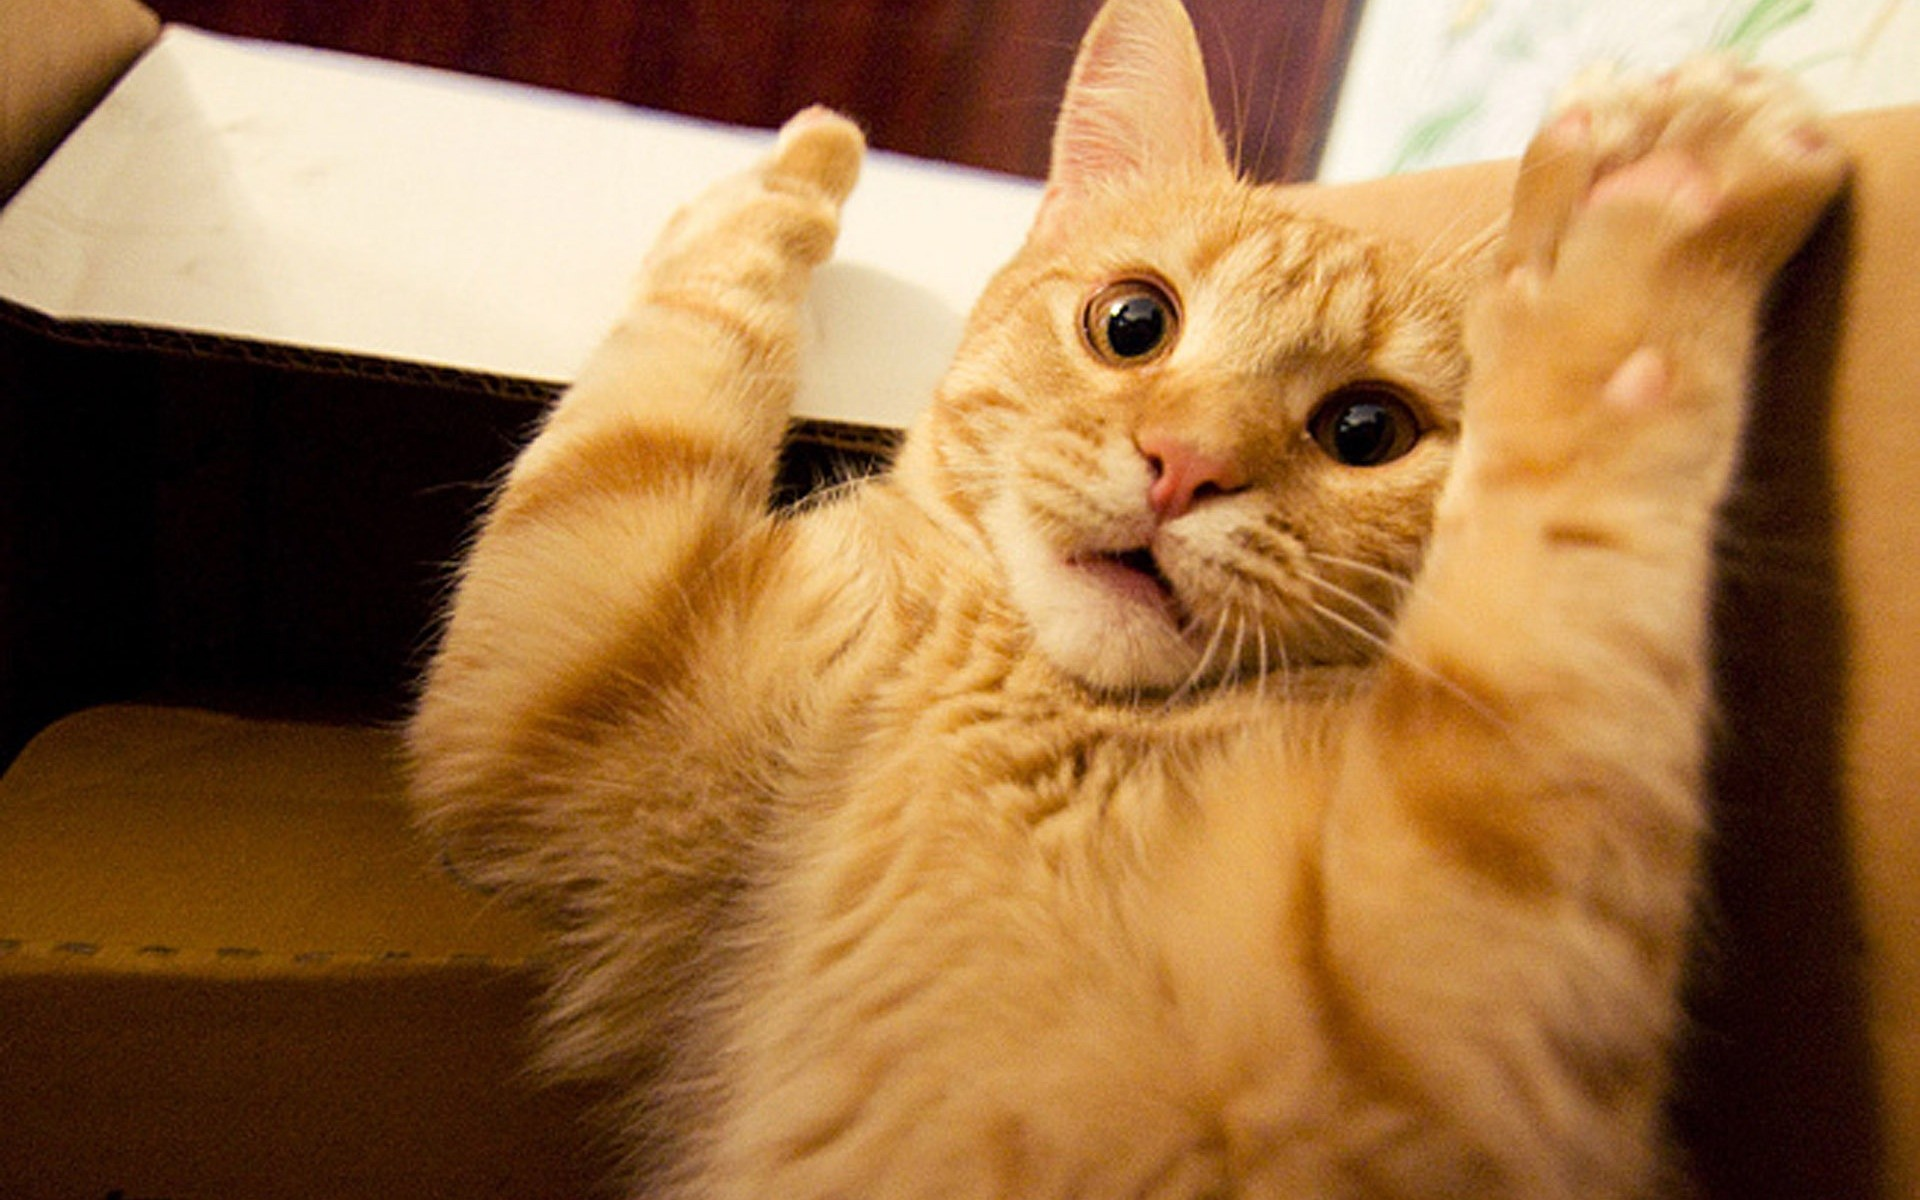 Cute cat 2 Wallpapers, Cute cat 2 Backgrounds, Cute cat 2 Free HD .